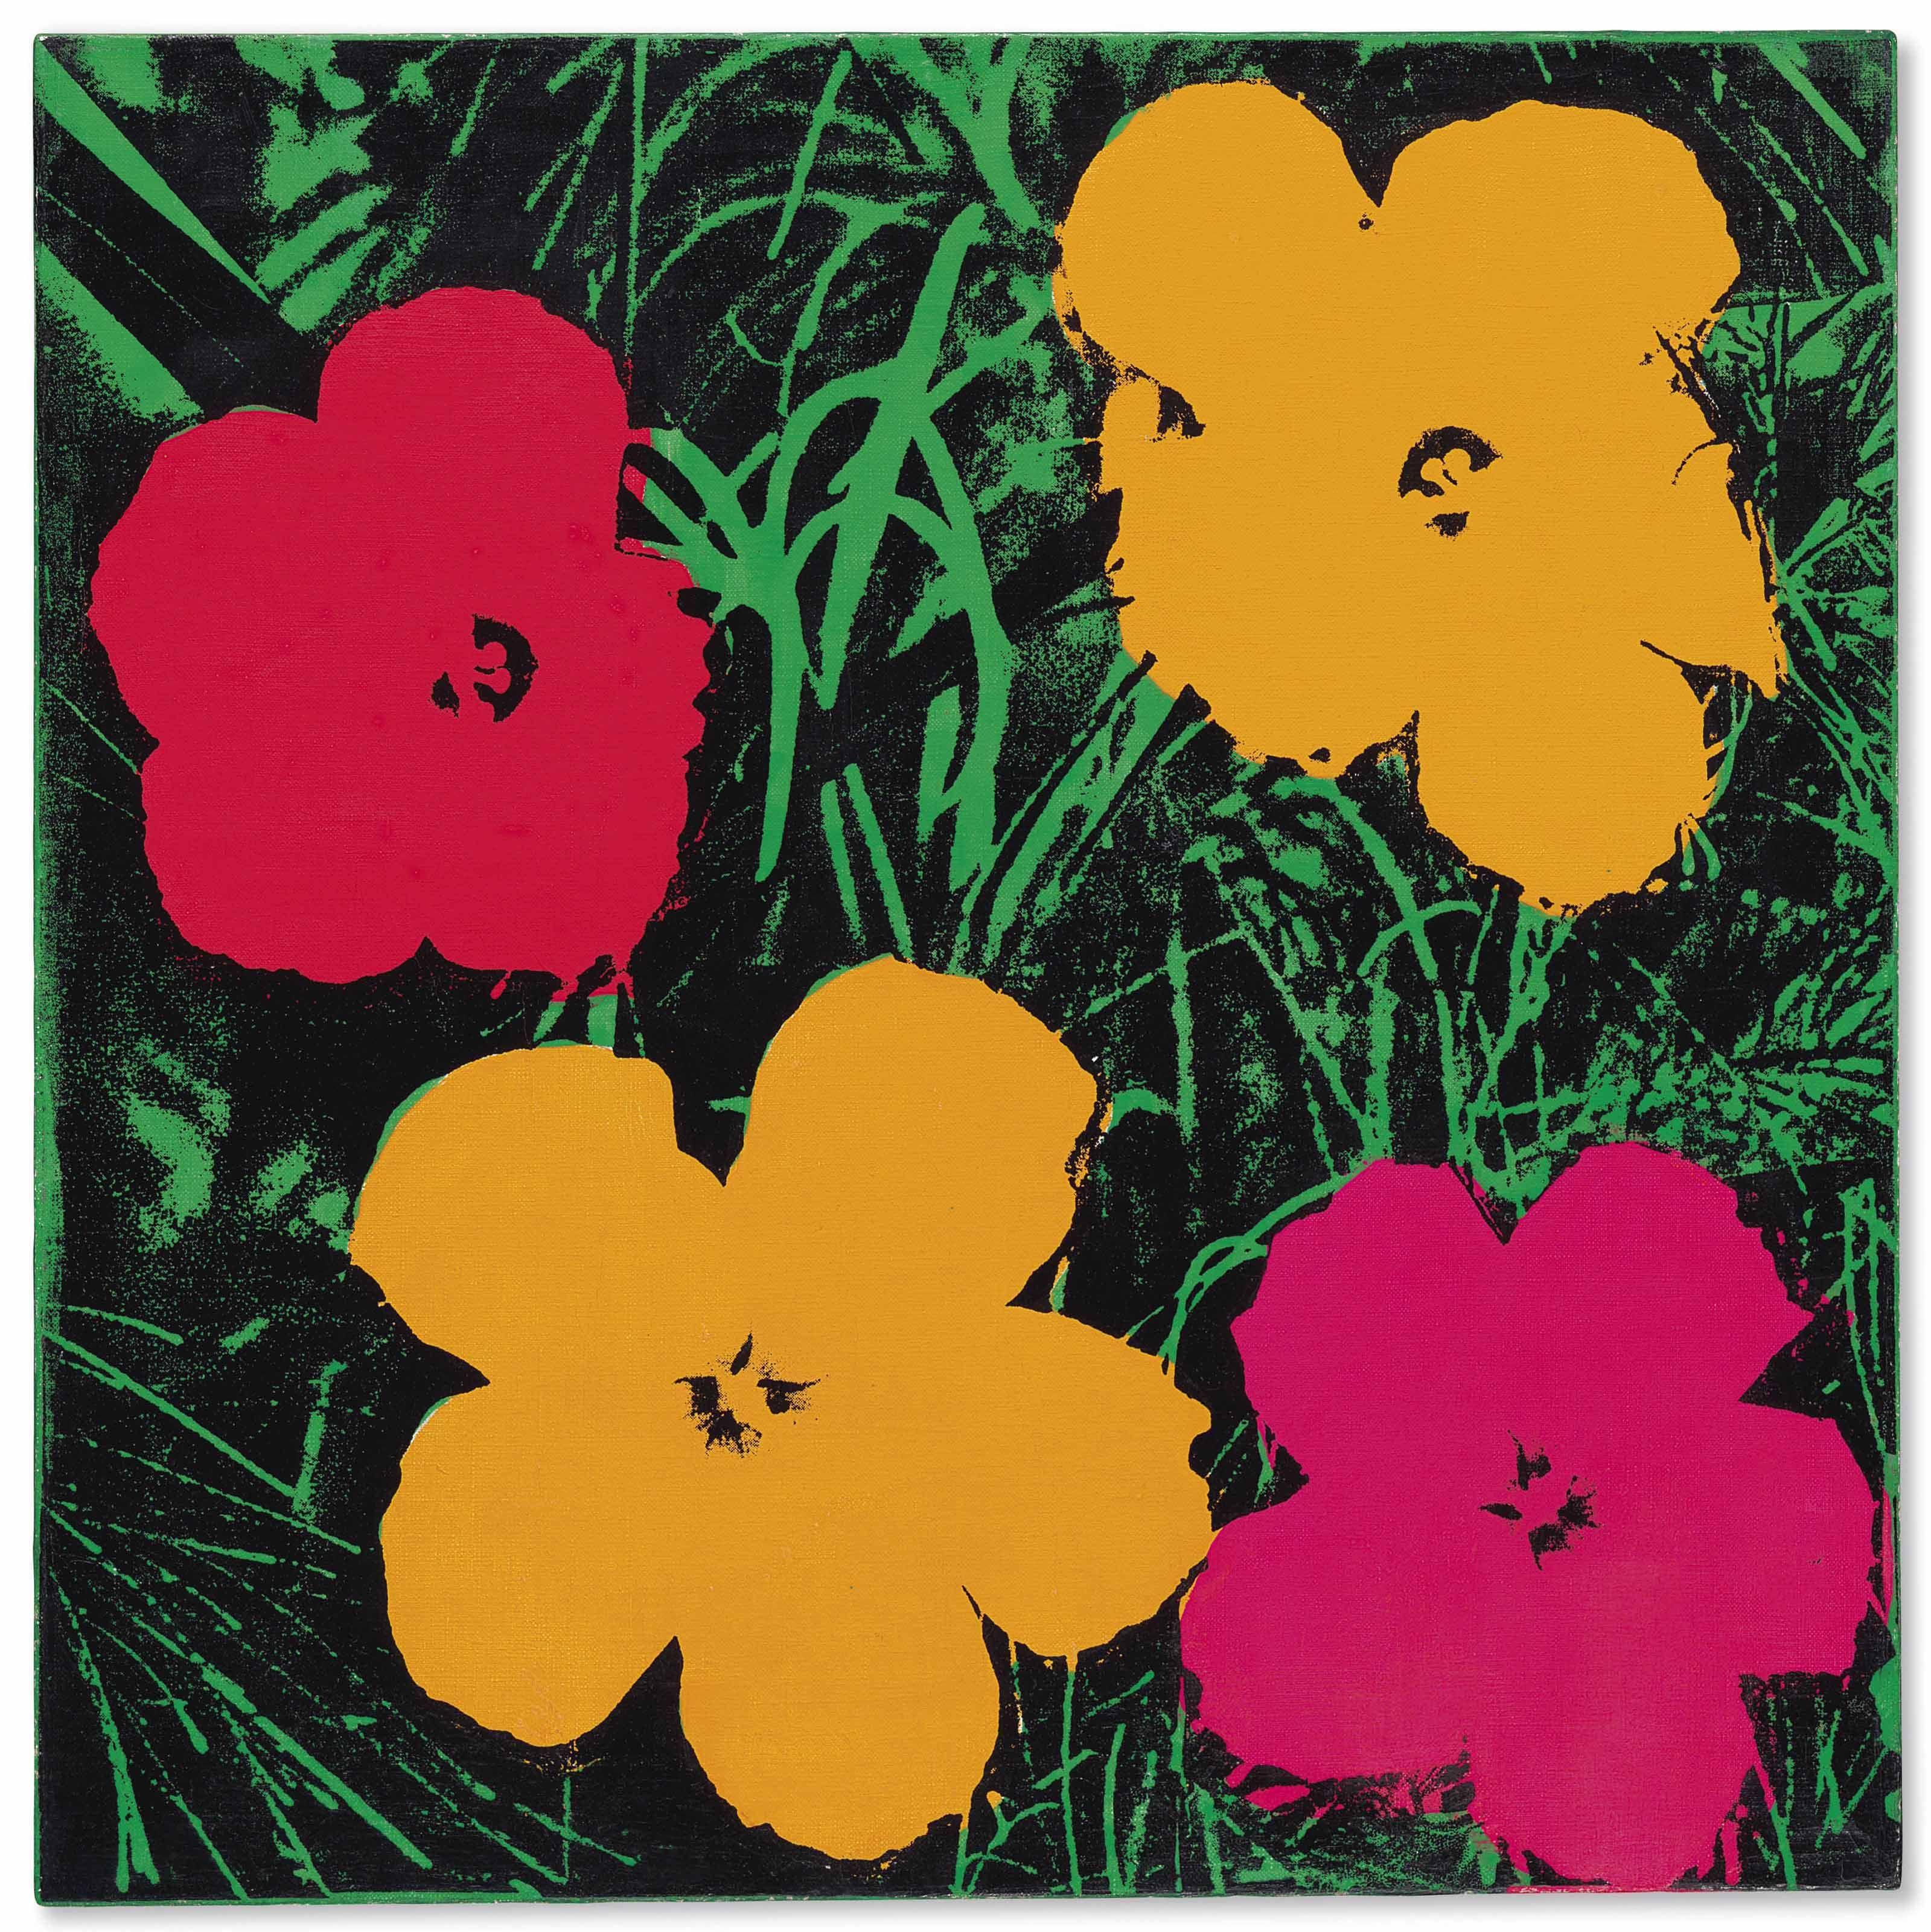 Flowers,Andy Warhol,1970 Andy warhol flowers, Warhol